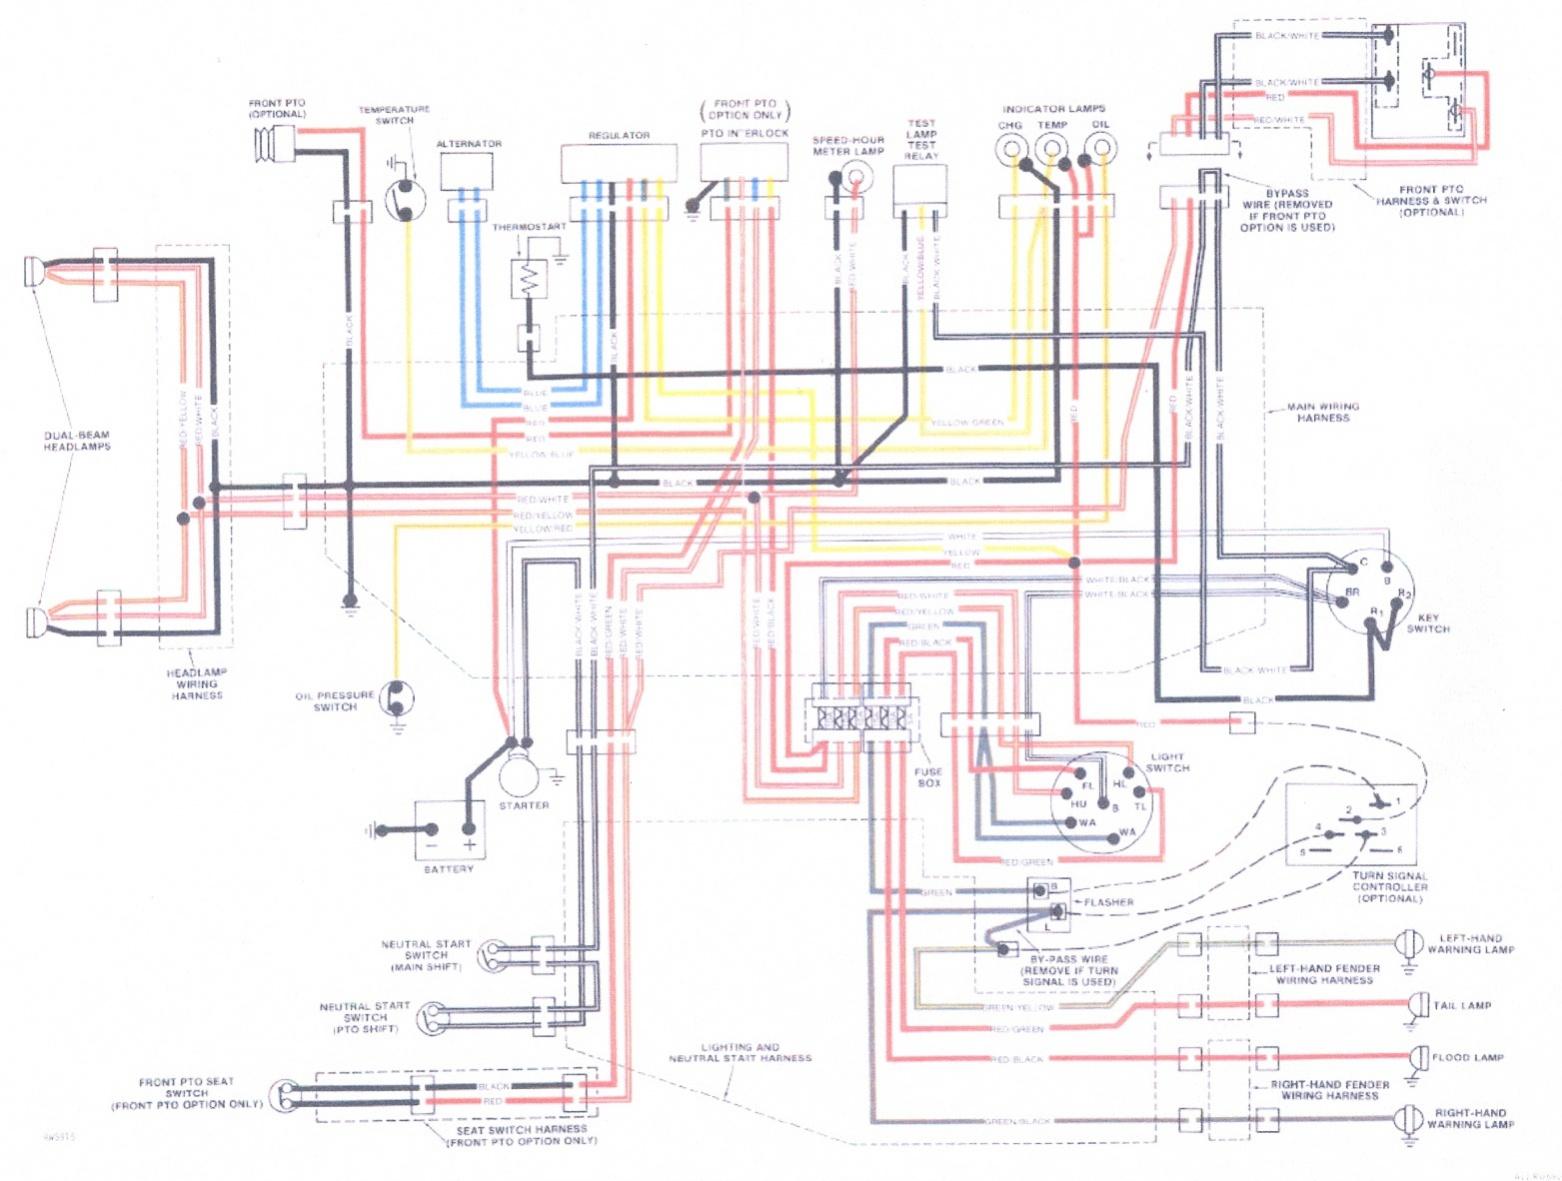 deere d100 wiring diagram john wiring diagrams john deere d100 wiring diagram